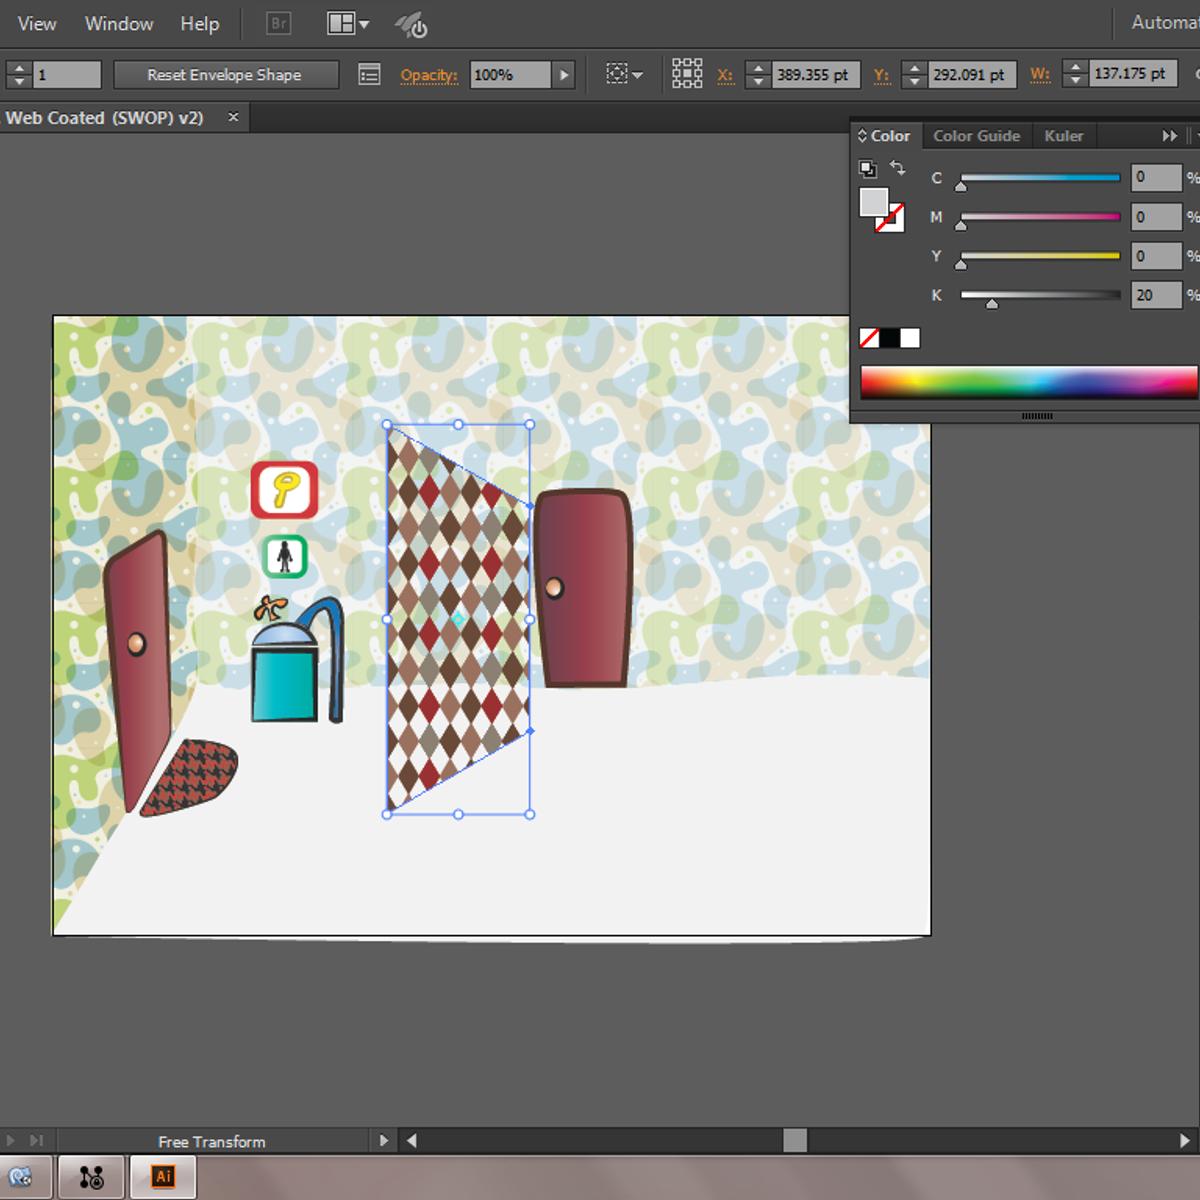 Home Network Design App Adobe Illustrator Cc Alternatives And Similar Software